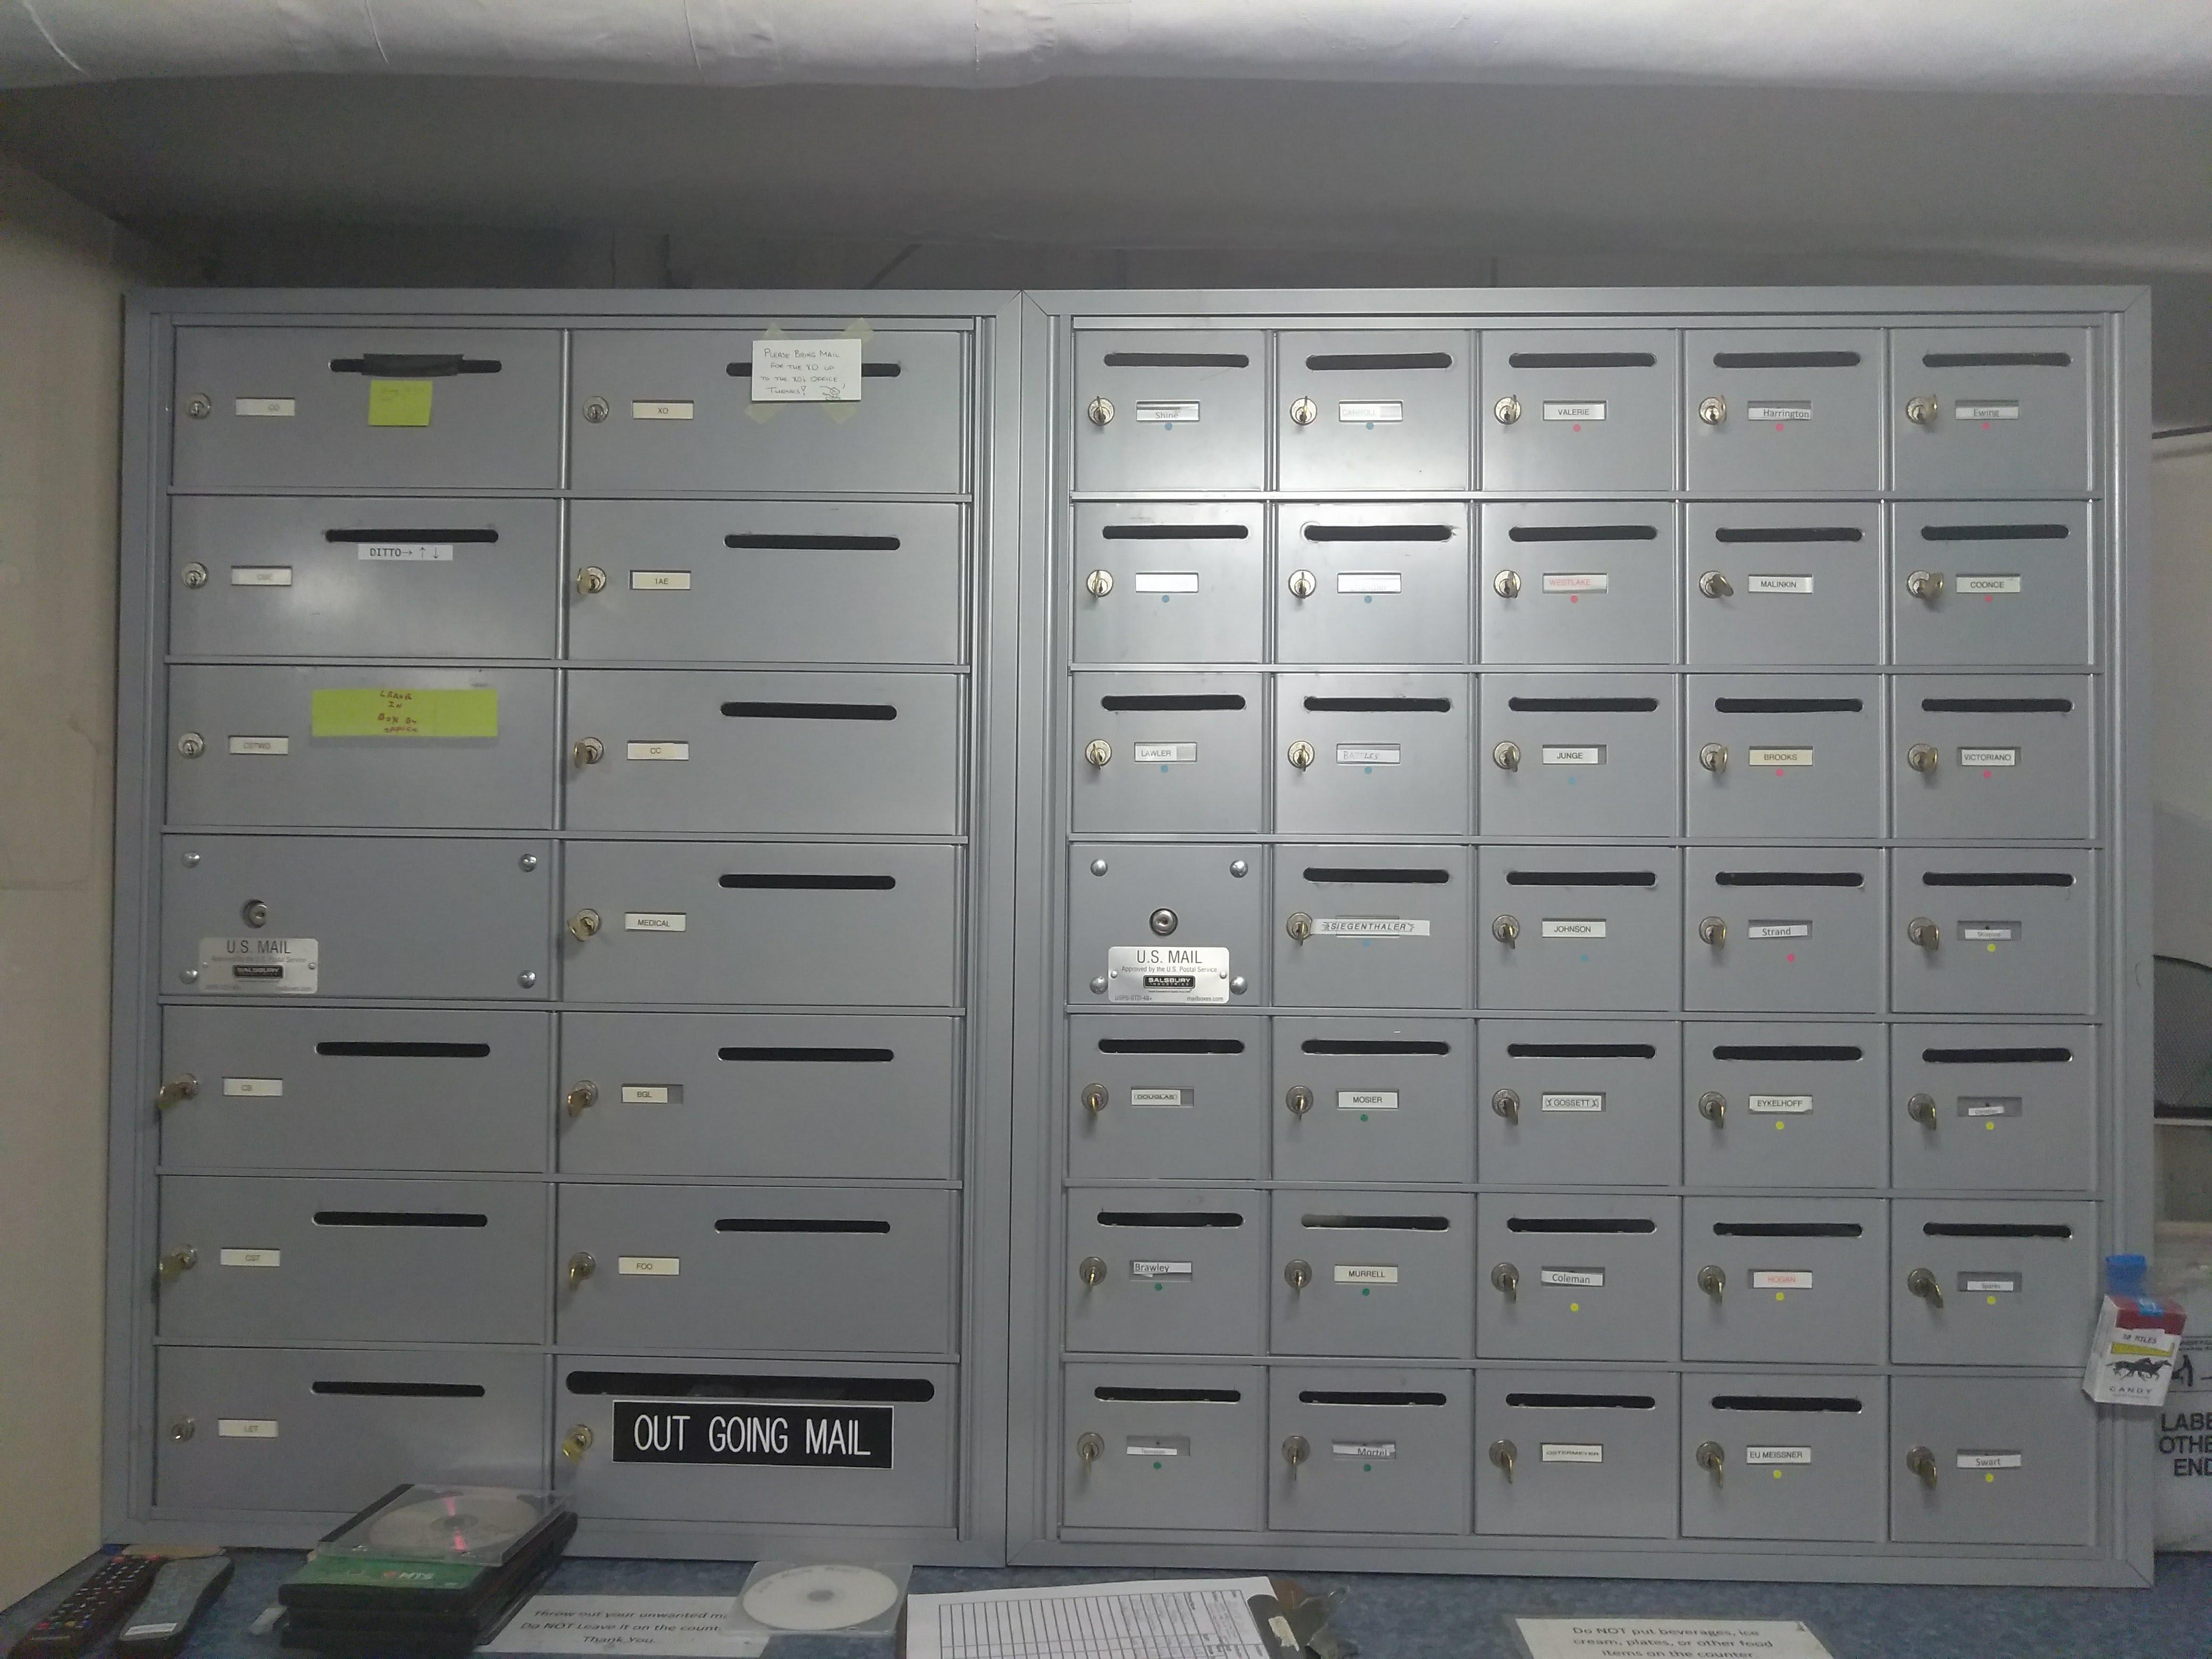 Ship's Mailroom